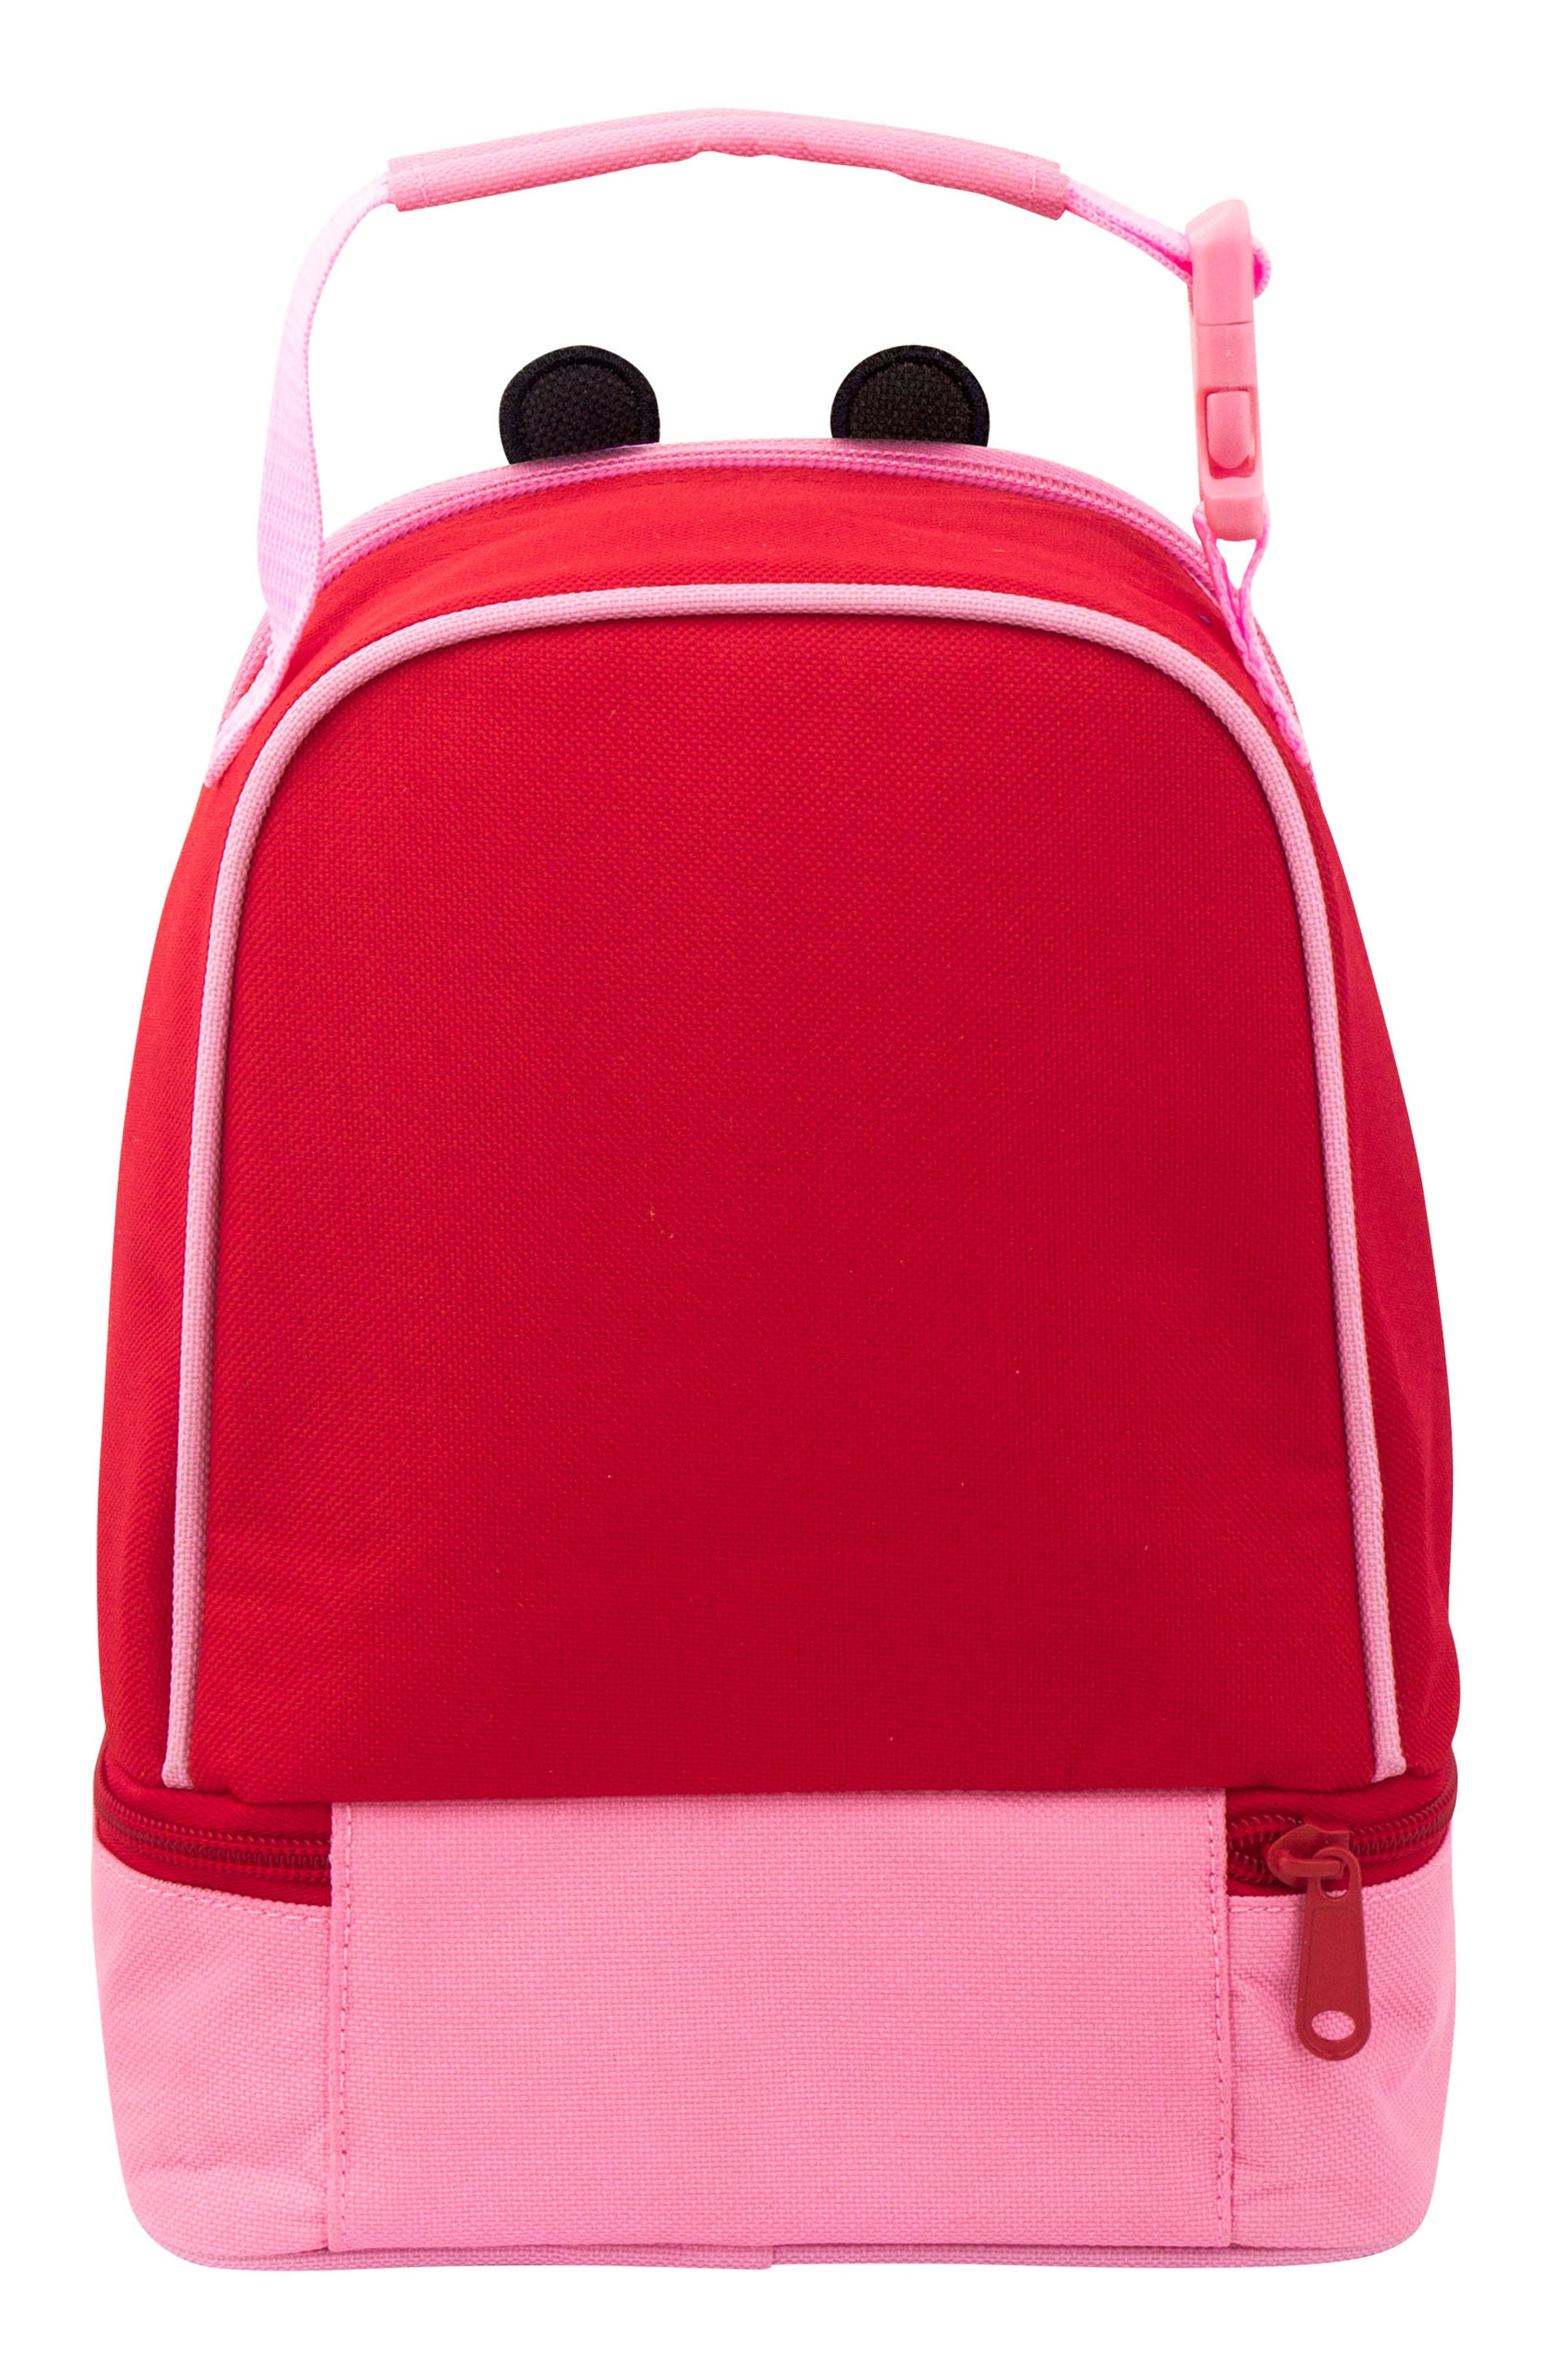 STEPHEN JOSEPH,                             Ladybug Sidekick Backpack & Lunch Pal,                             Alternate thumbnail 5, color,                             LADYBUG